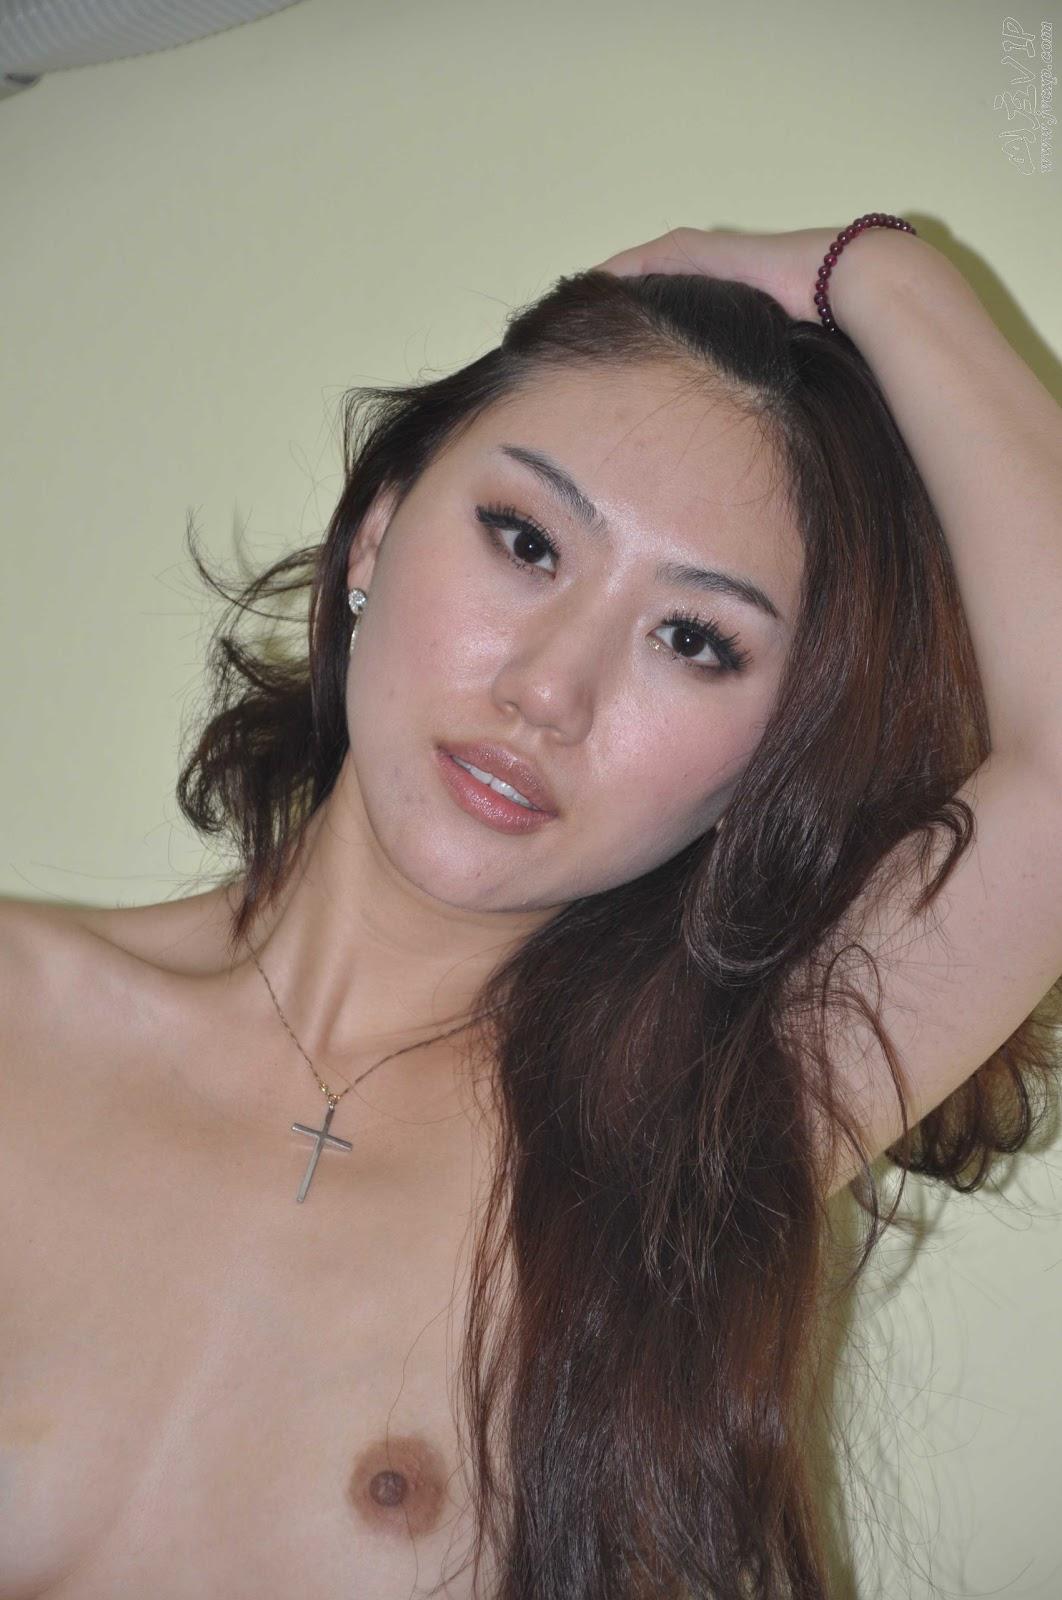 http://4.bp.blogspot.com/_Pea0TgvFWFA/TVJLfqVlf5I/AAAAAAAADik/zs9CwdfMAg0/s1600/World+Supermodel+Contest+China+Winner+Leaked+Nude+Photos+www.GutterUncensoredPlus.com+132.jpg